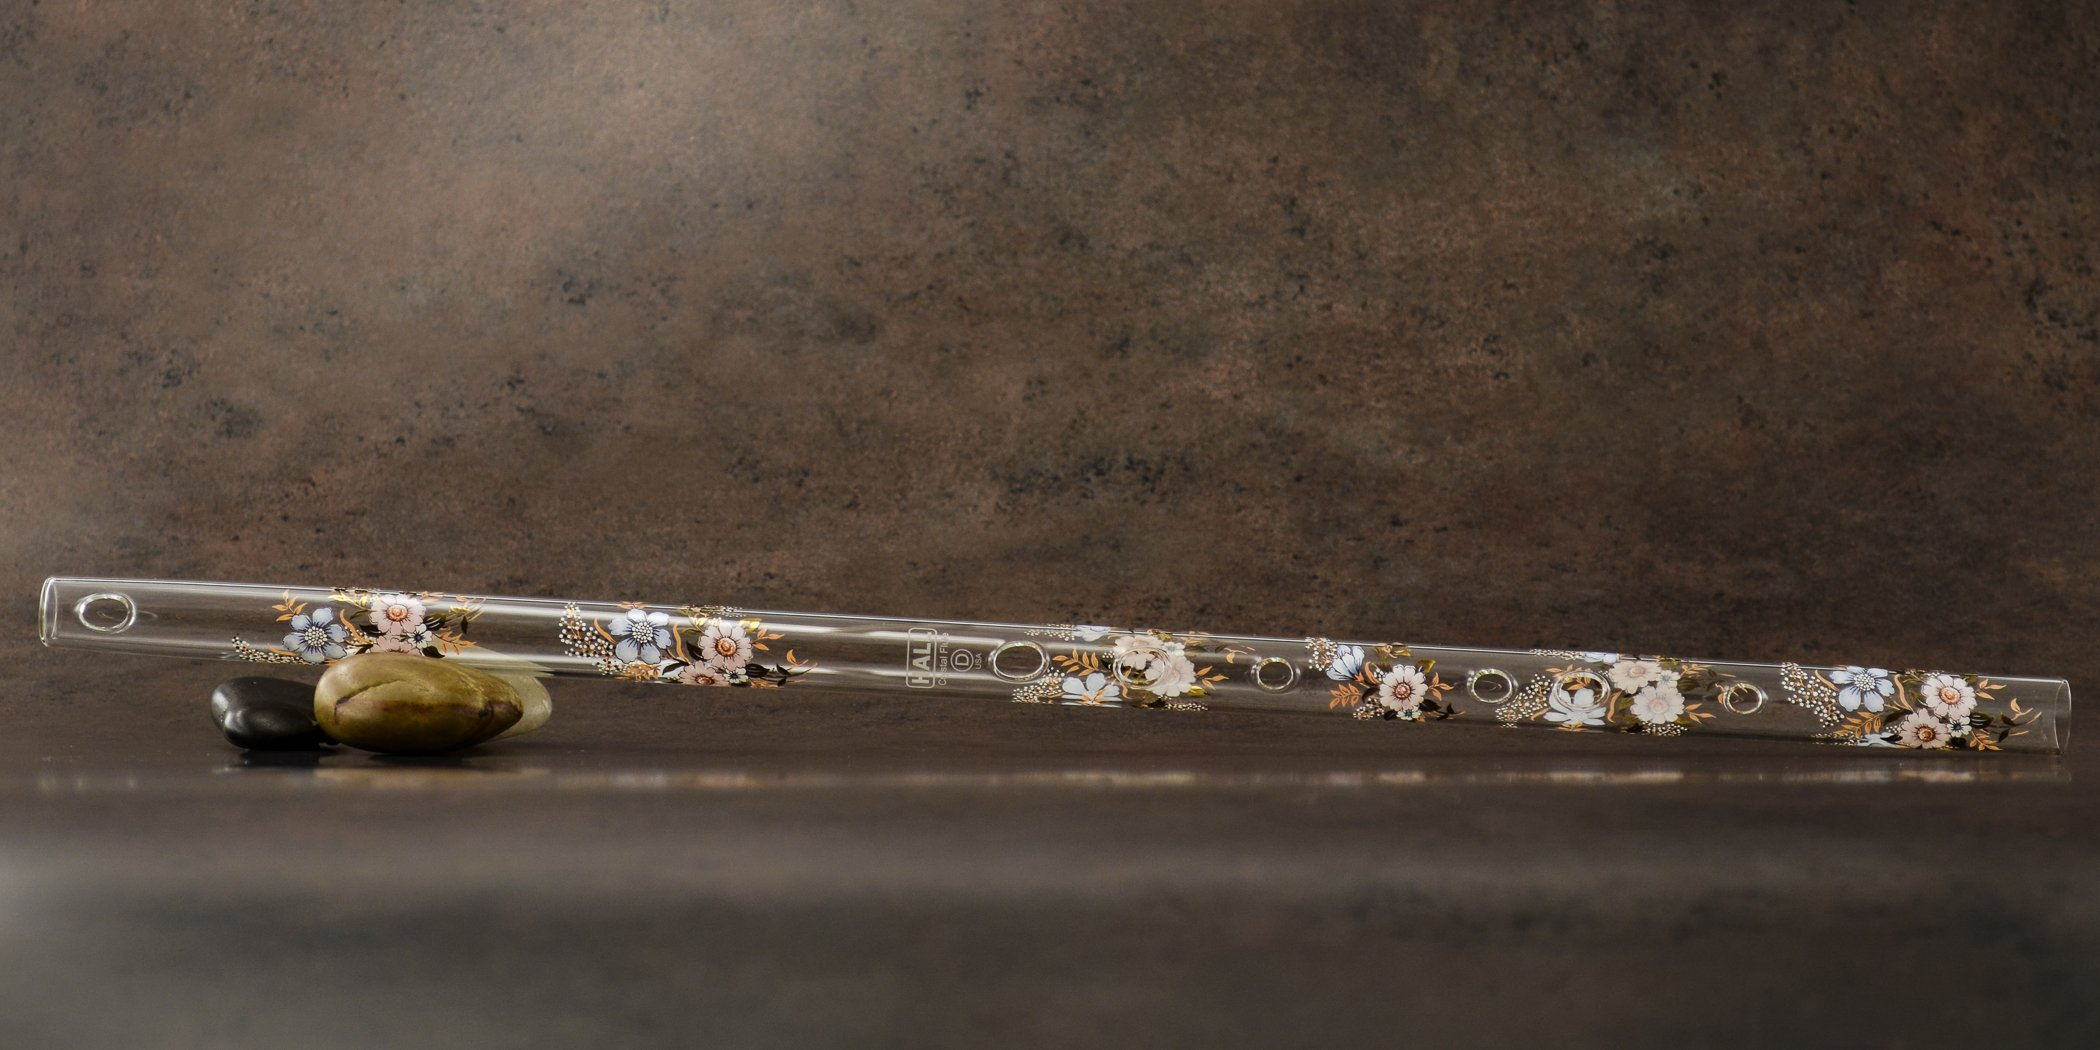 Hall Crystal Flute 22202 - Offset Glass Flute in D - Carolina